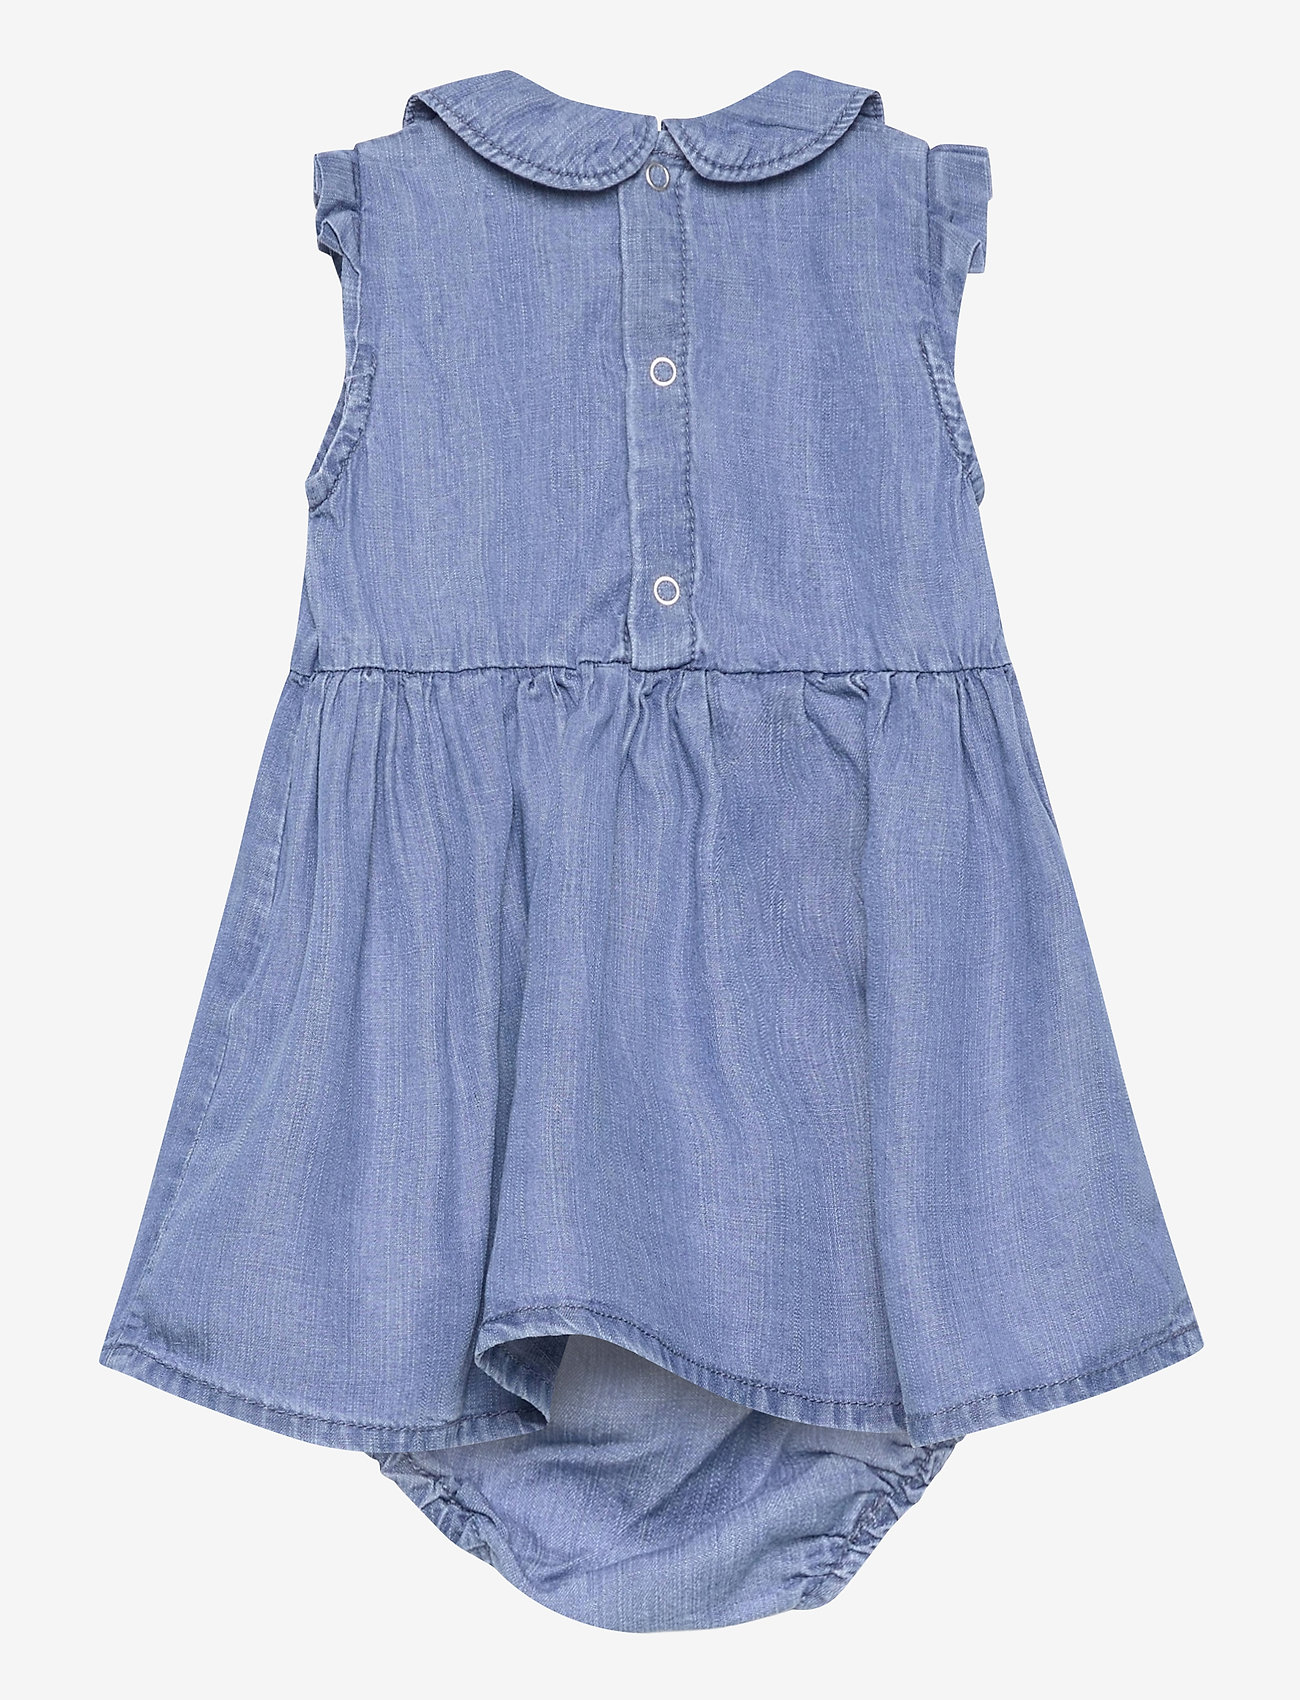 name it - NBFATHIT DNM 2522 S/S DRESS W TROUSERS - kleider - medium blue denim - 1